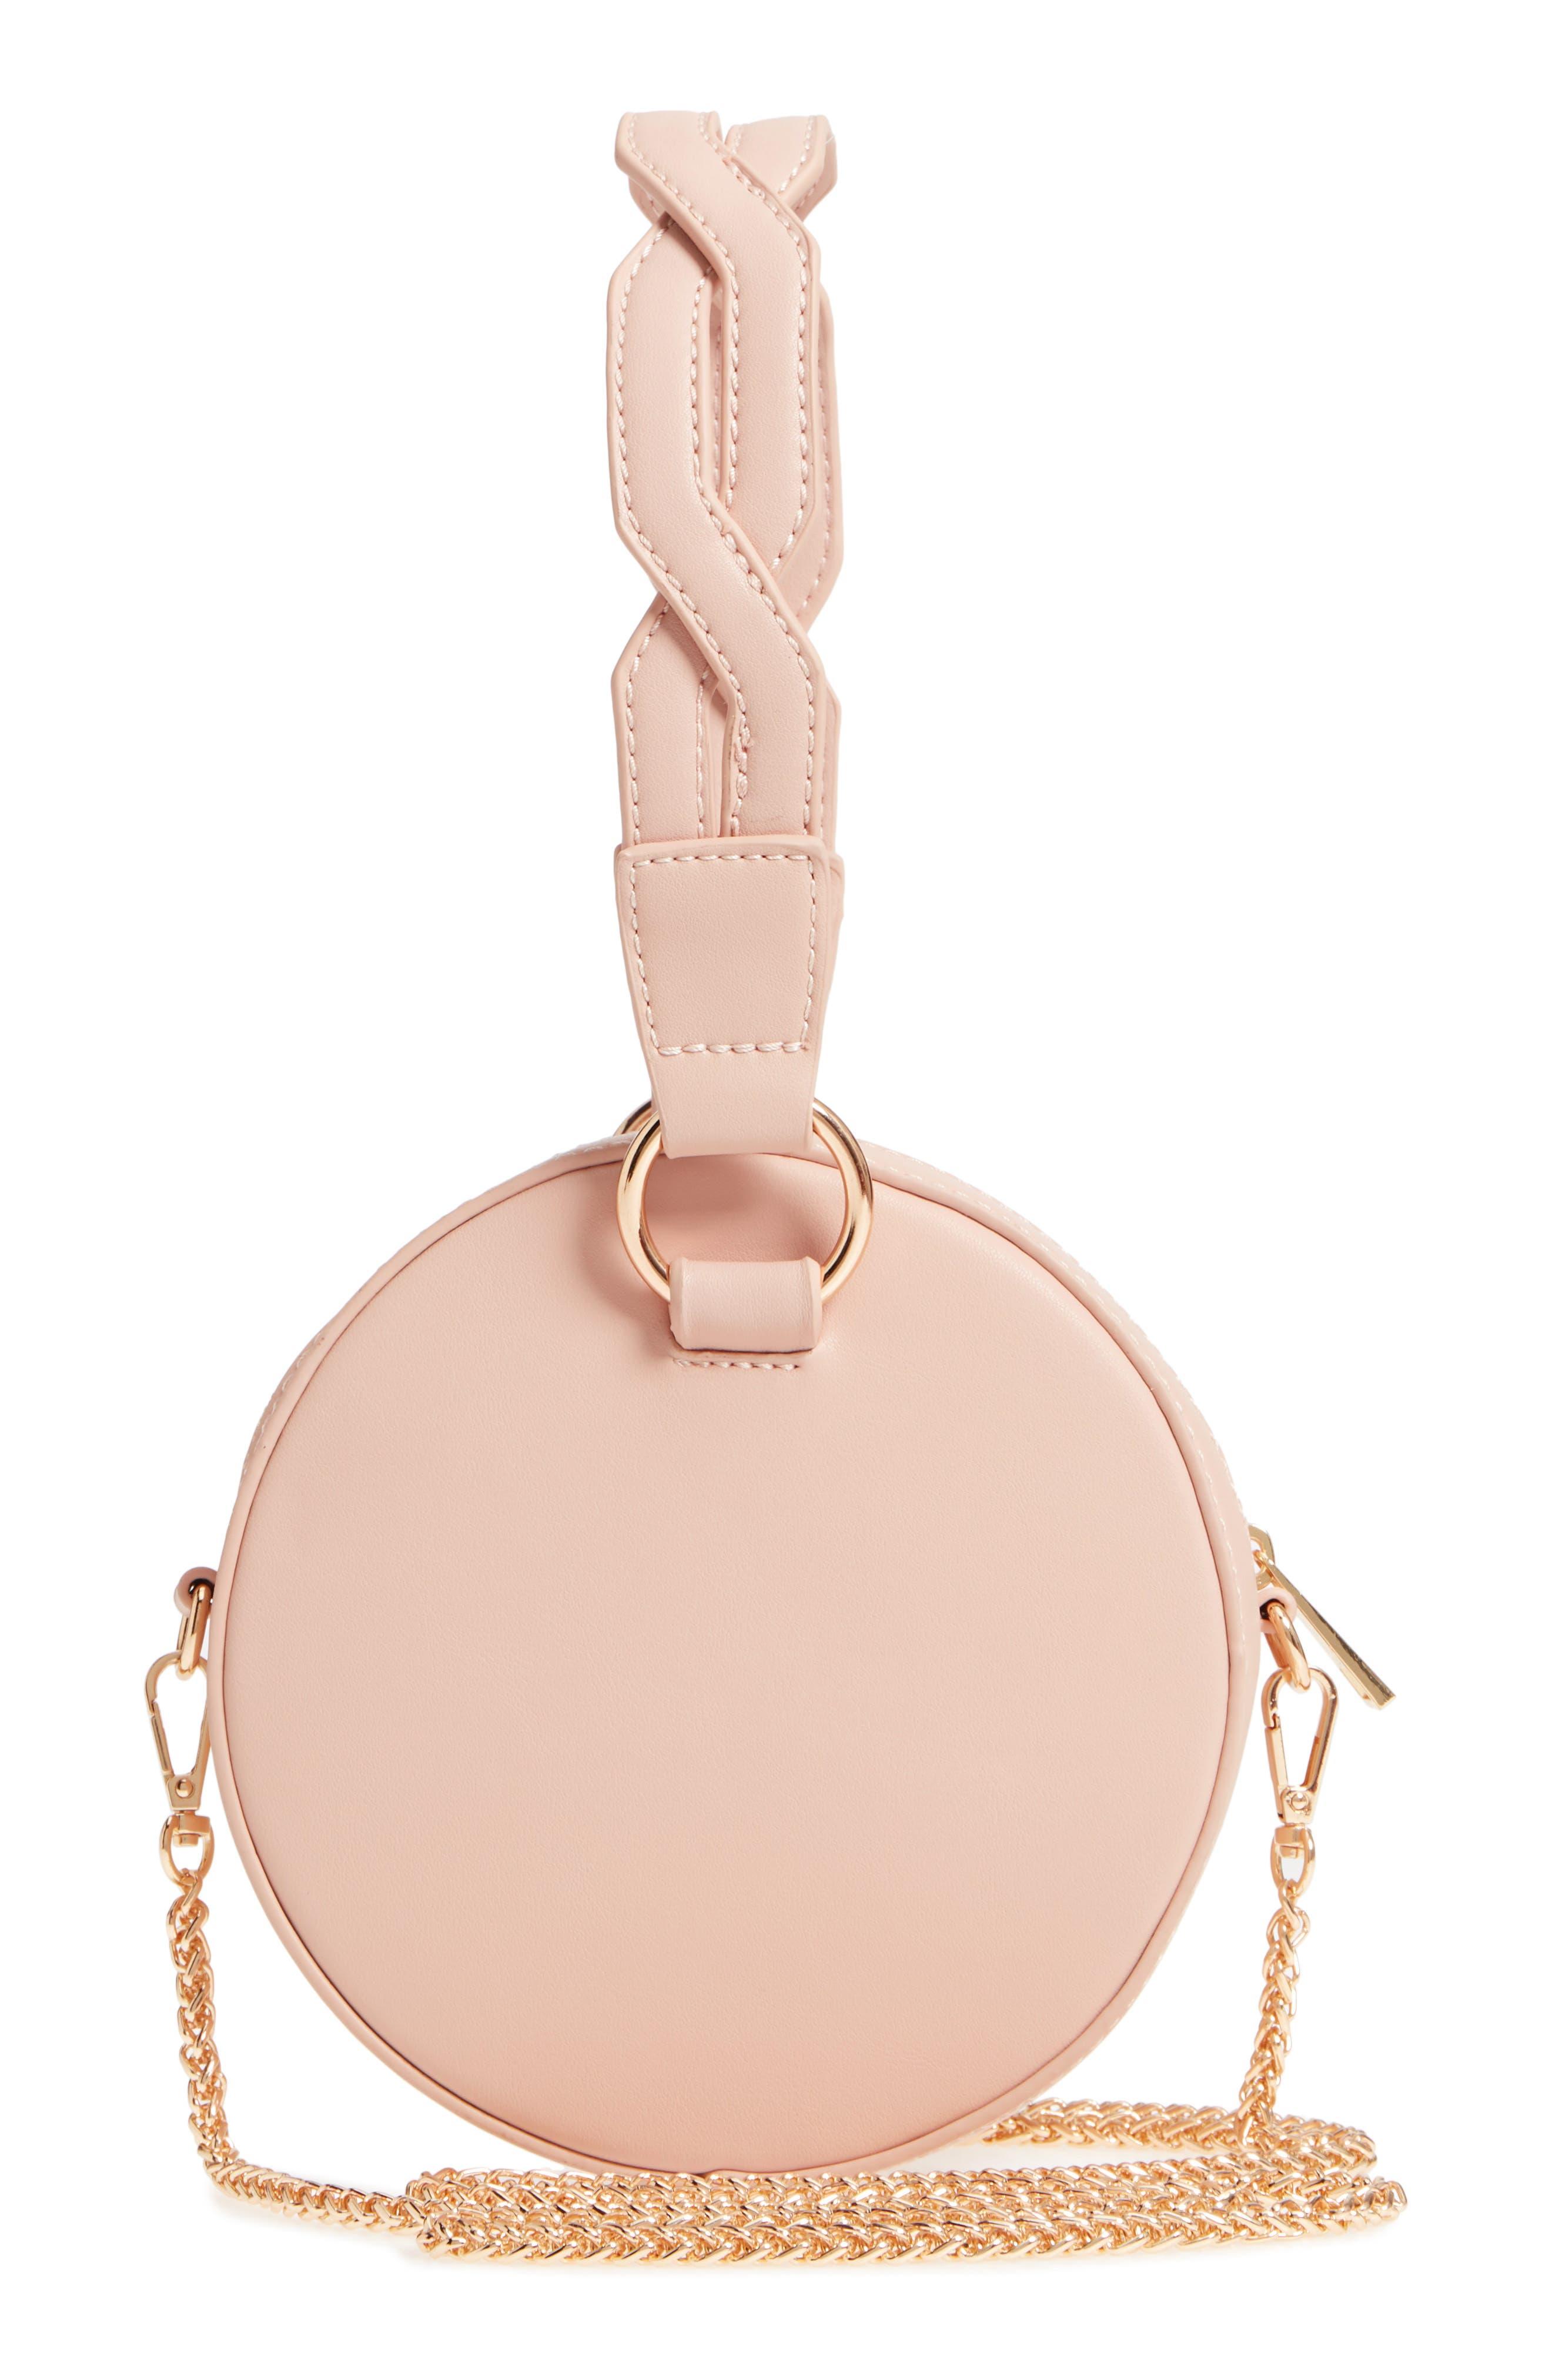 Circle Bag with Wristlet,                             Alternate thumbnail 3, color,                             Tan